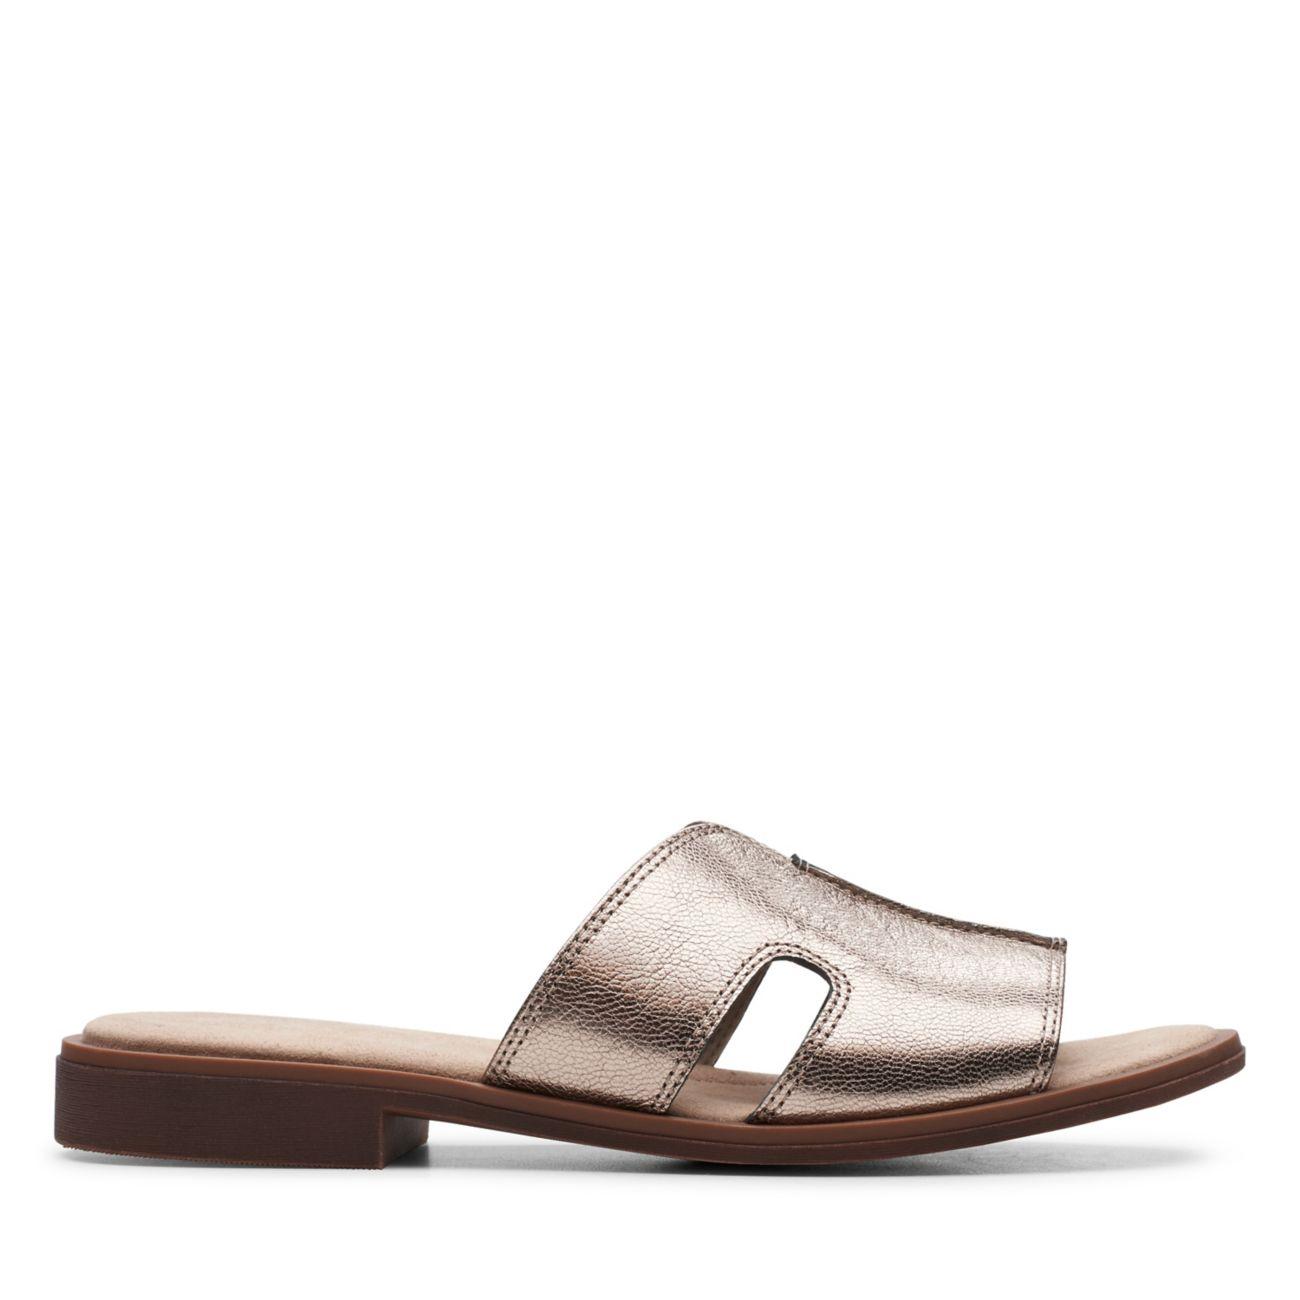 Declan Flo Metallic Leather - Clarks® Shoes Official Site   Clarks